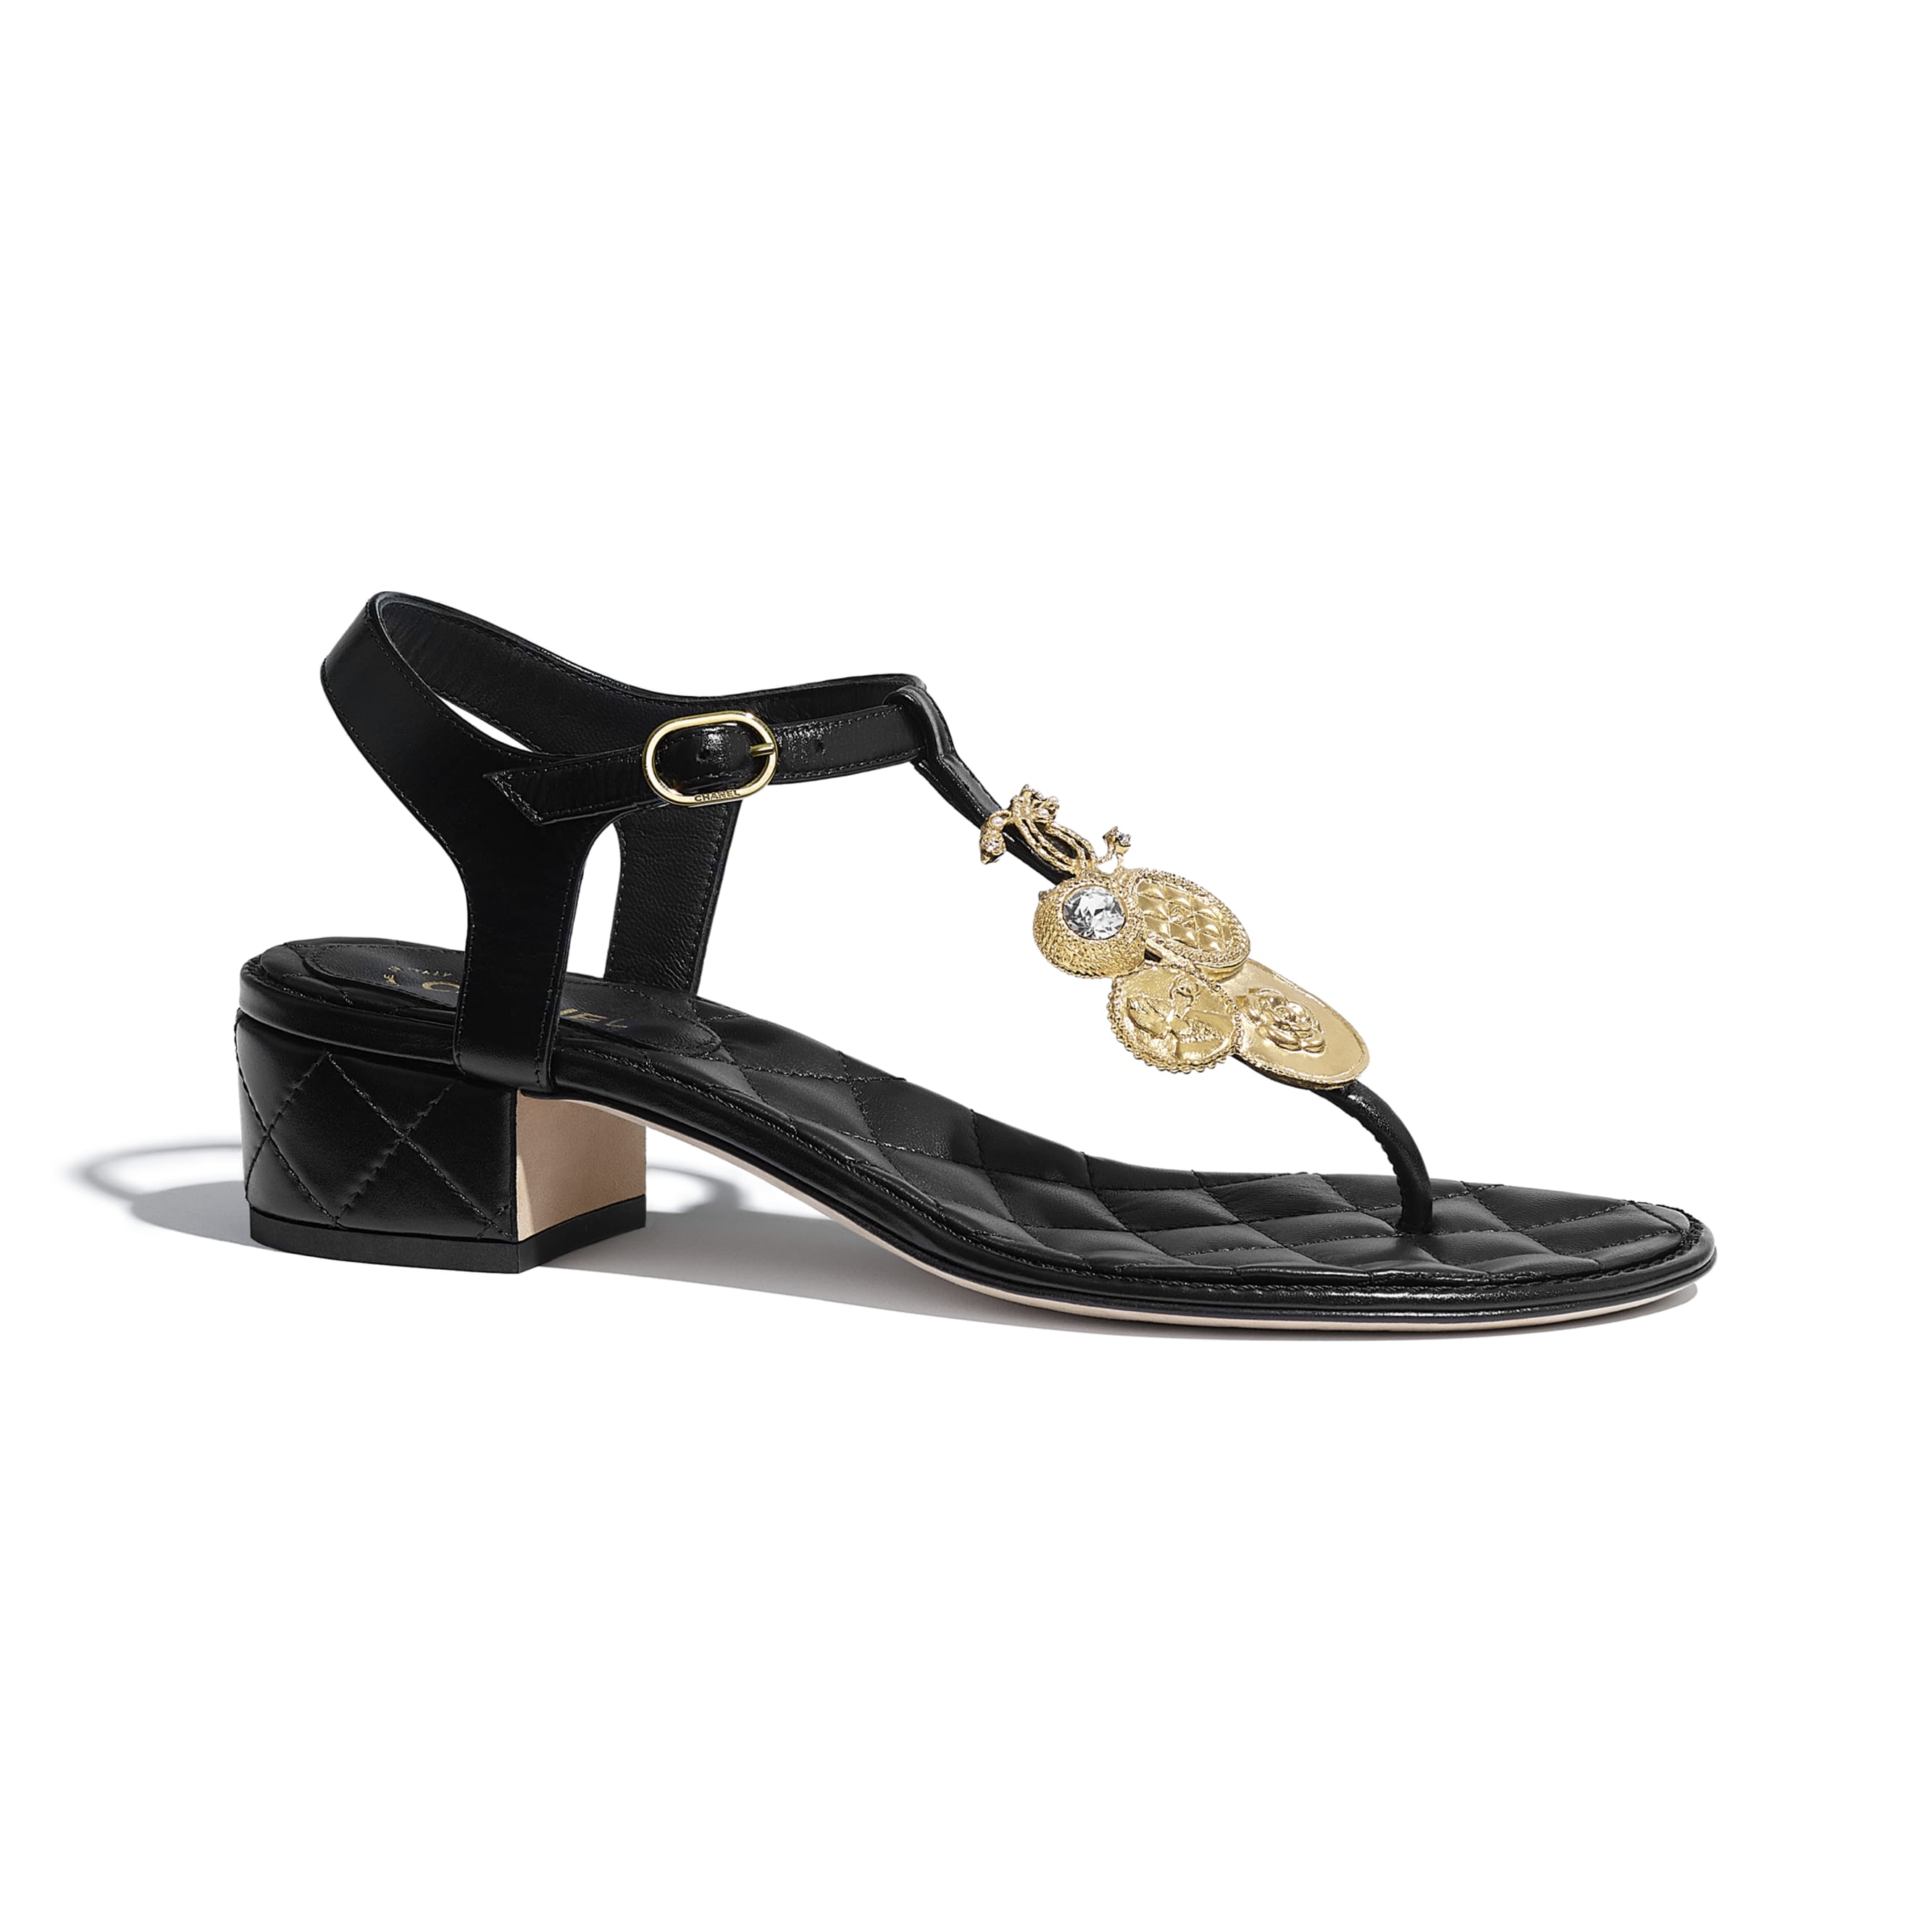 Sandals - Black - Calfskin - CHANEL - Default view - see standard sized version